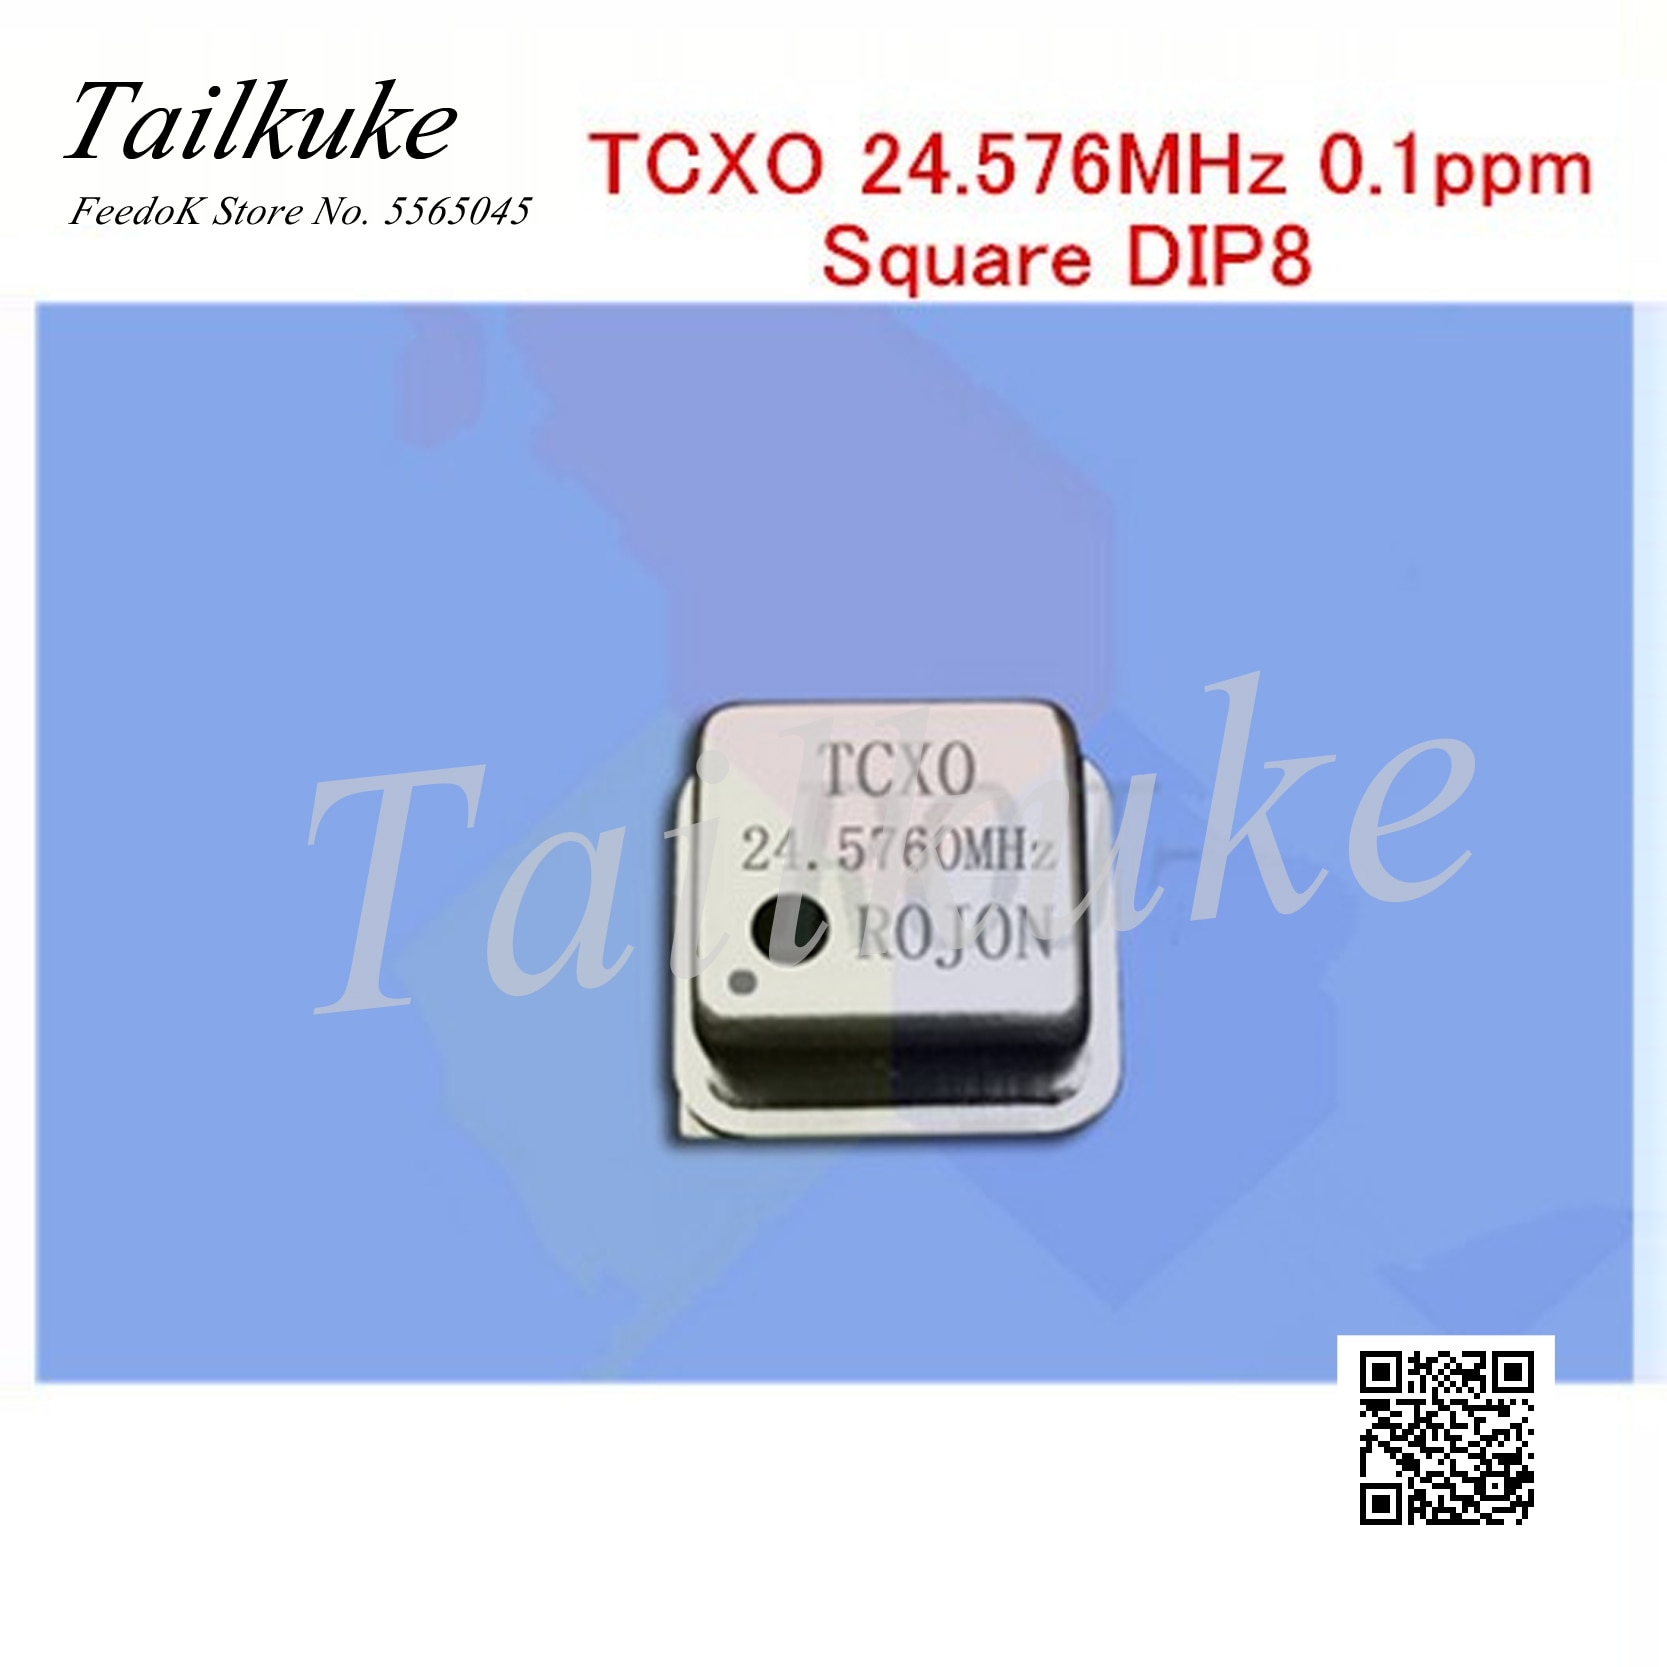 Sonido DIY Fihi, alta precisión, compensación de temperatura, oscilador de cristal TCXO 24.576MHz 0,1 ppm, Cuadrado DIP8